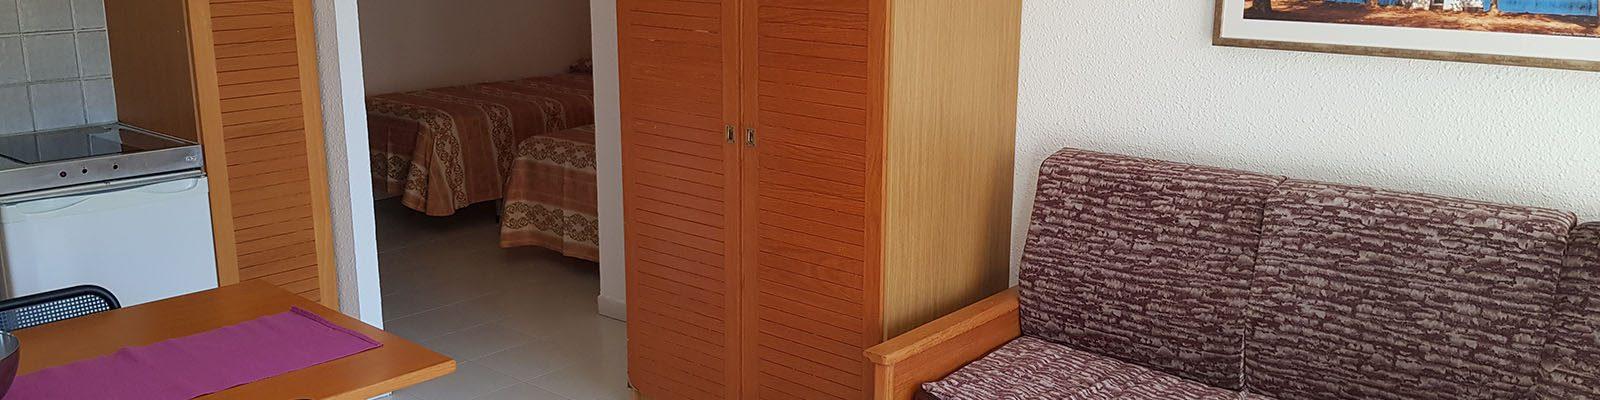 Estudi B 2_4 Vista camas